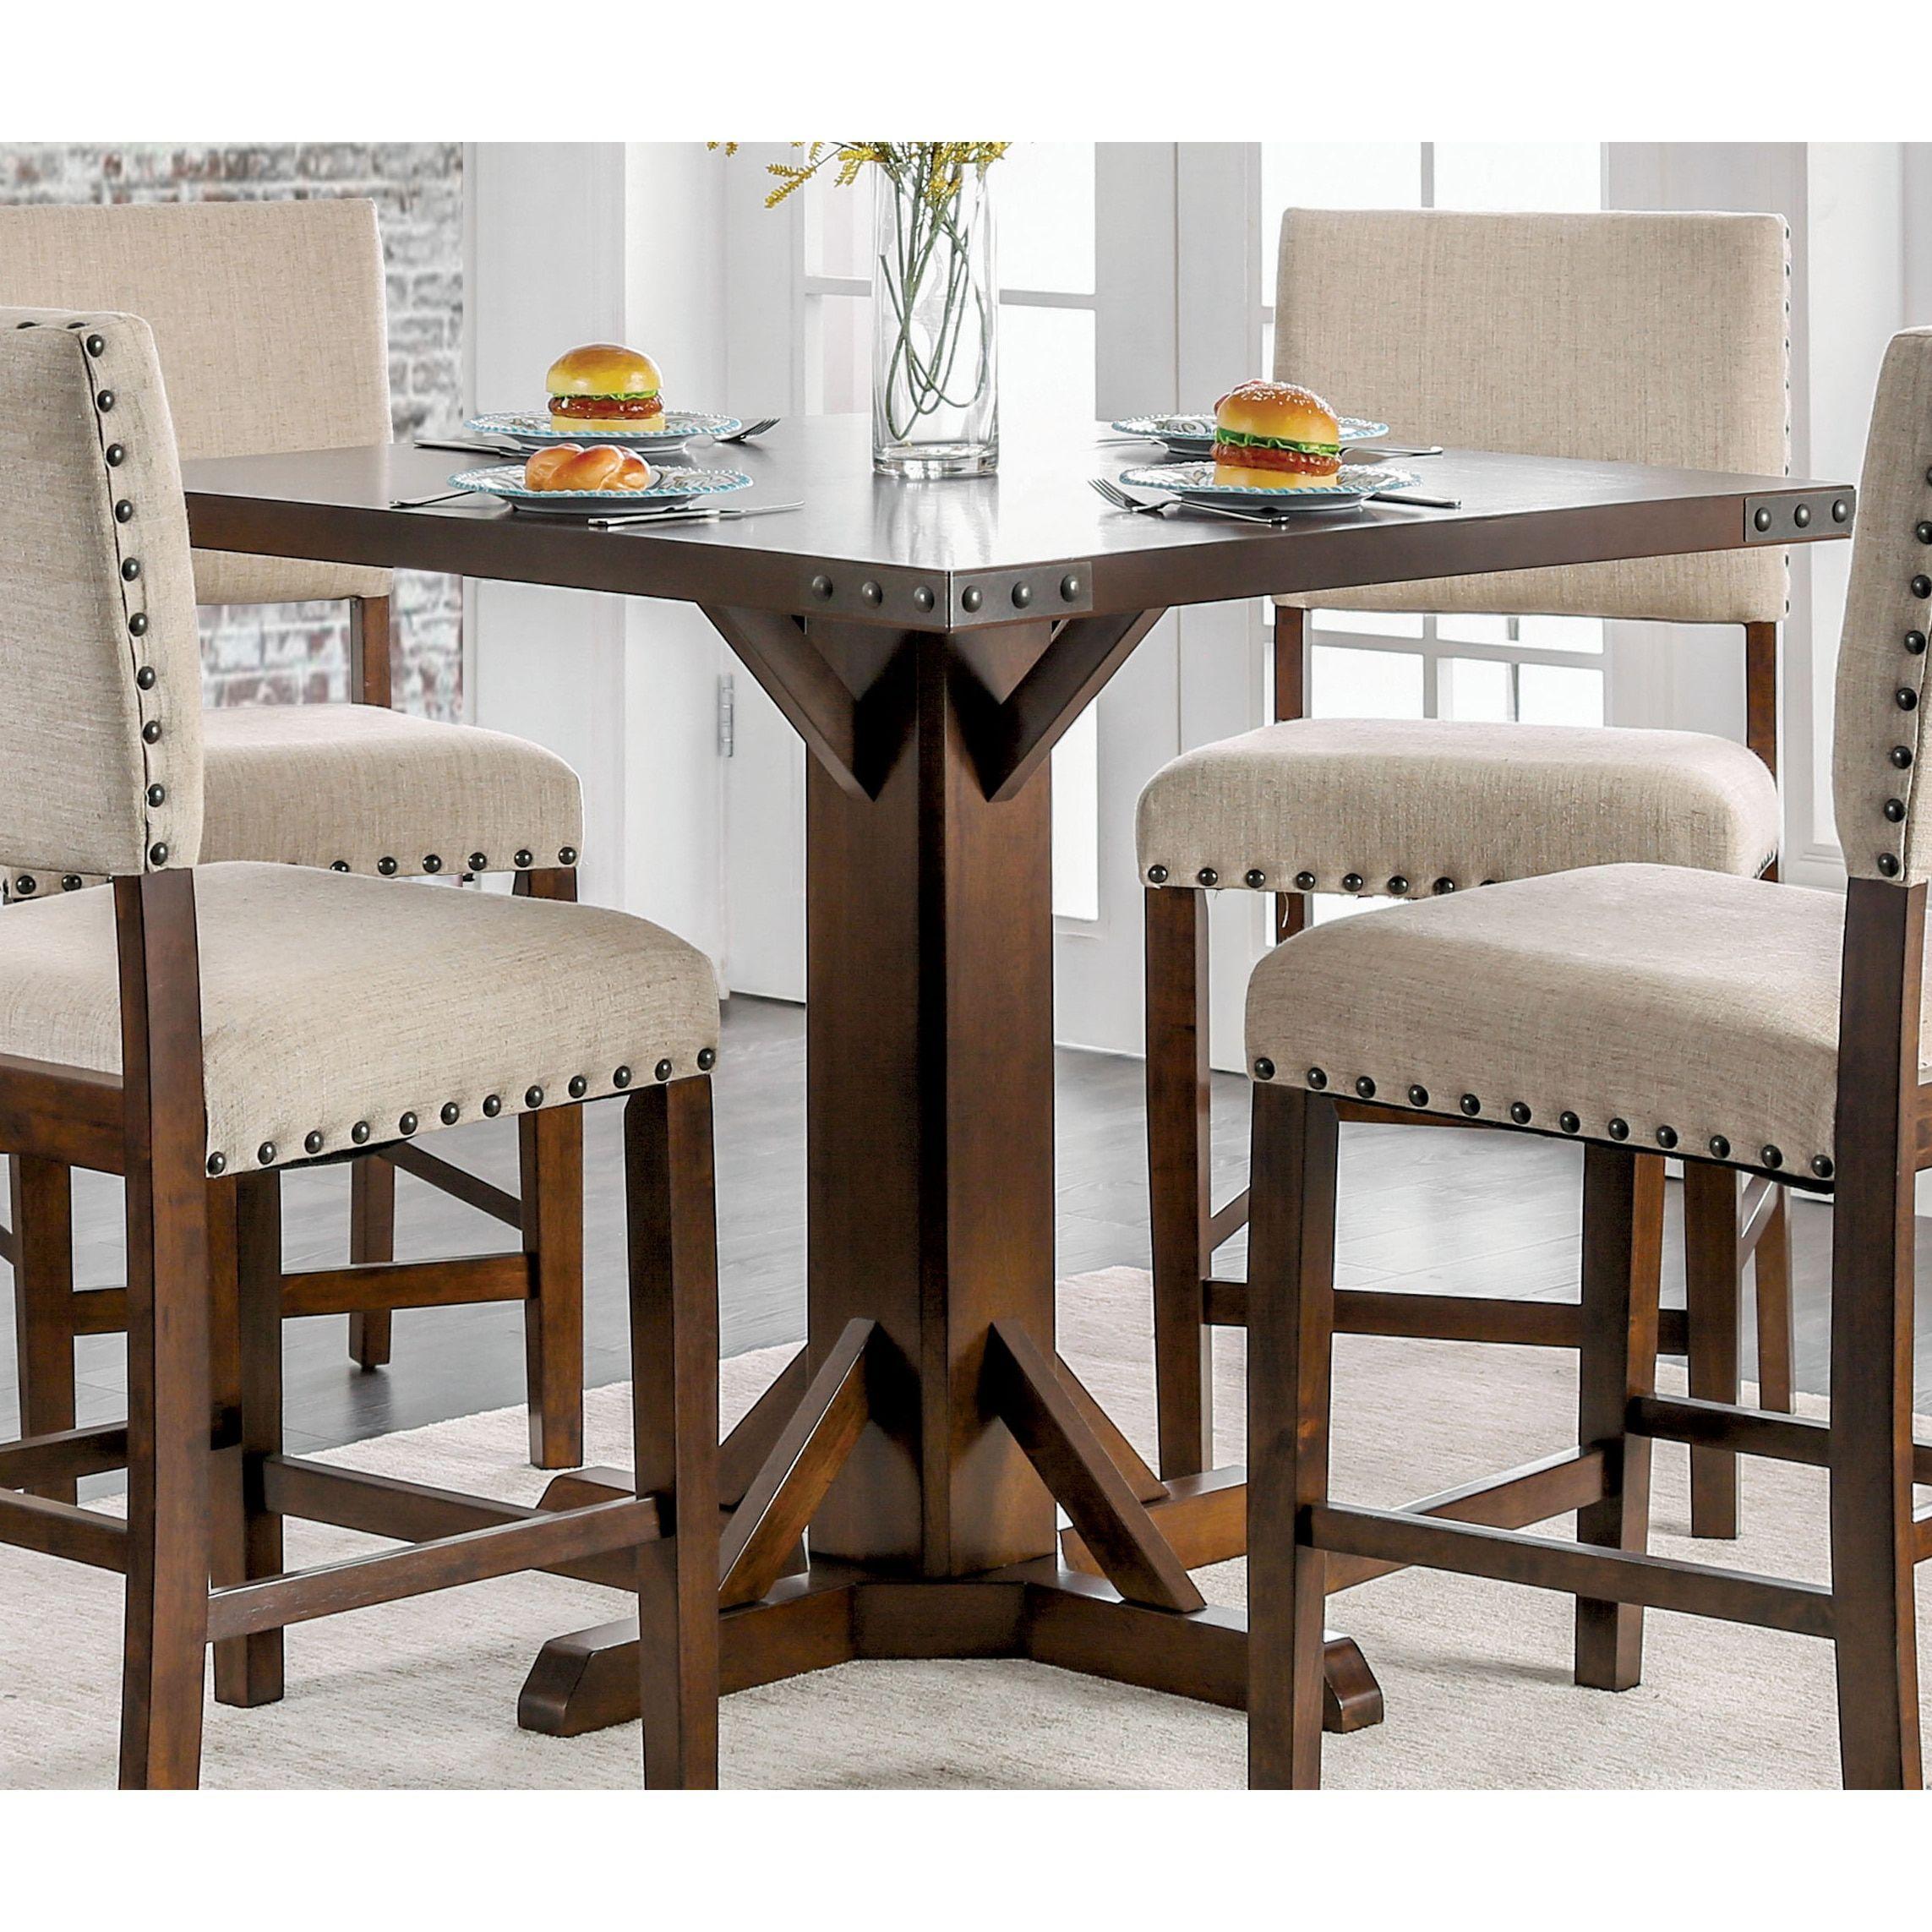 Furniture of America Banea Rustic Nailhead Brown Cherry Counter